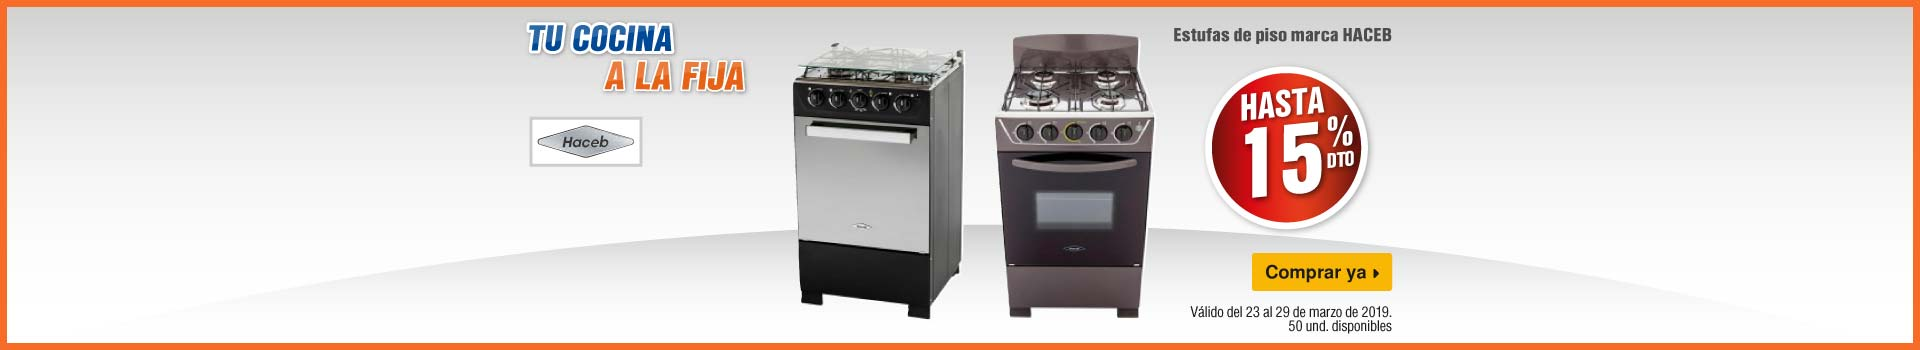 AK-KT-mayores-1-ELECT-BCAT-cocina-haceb-230319